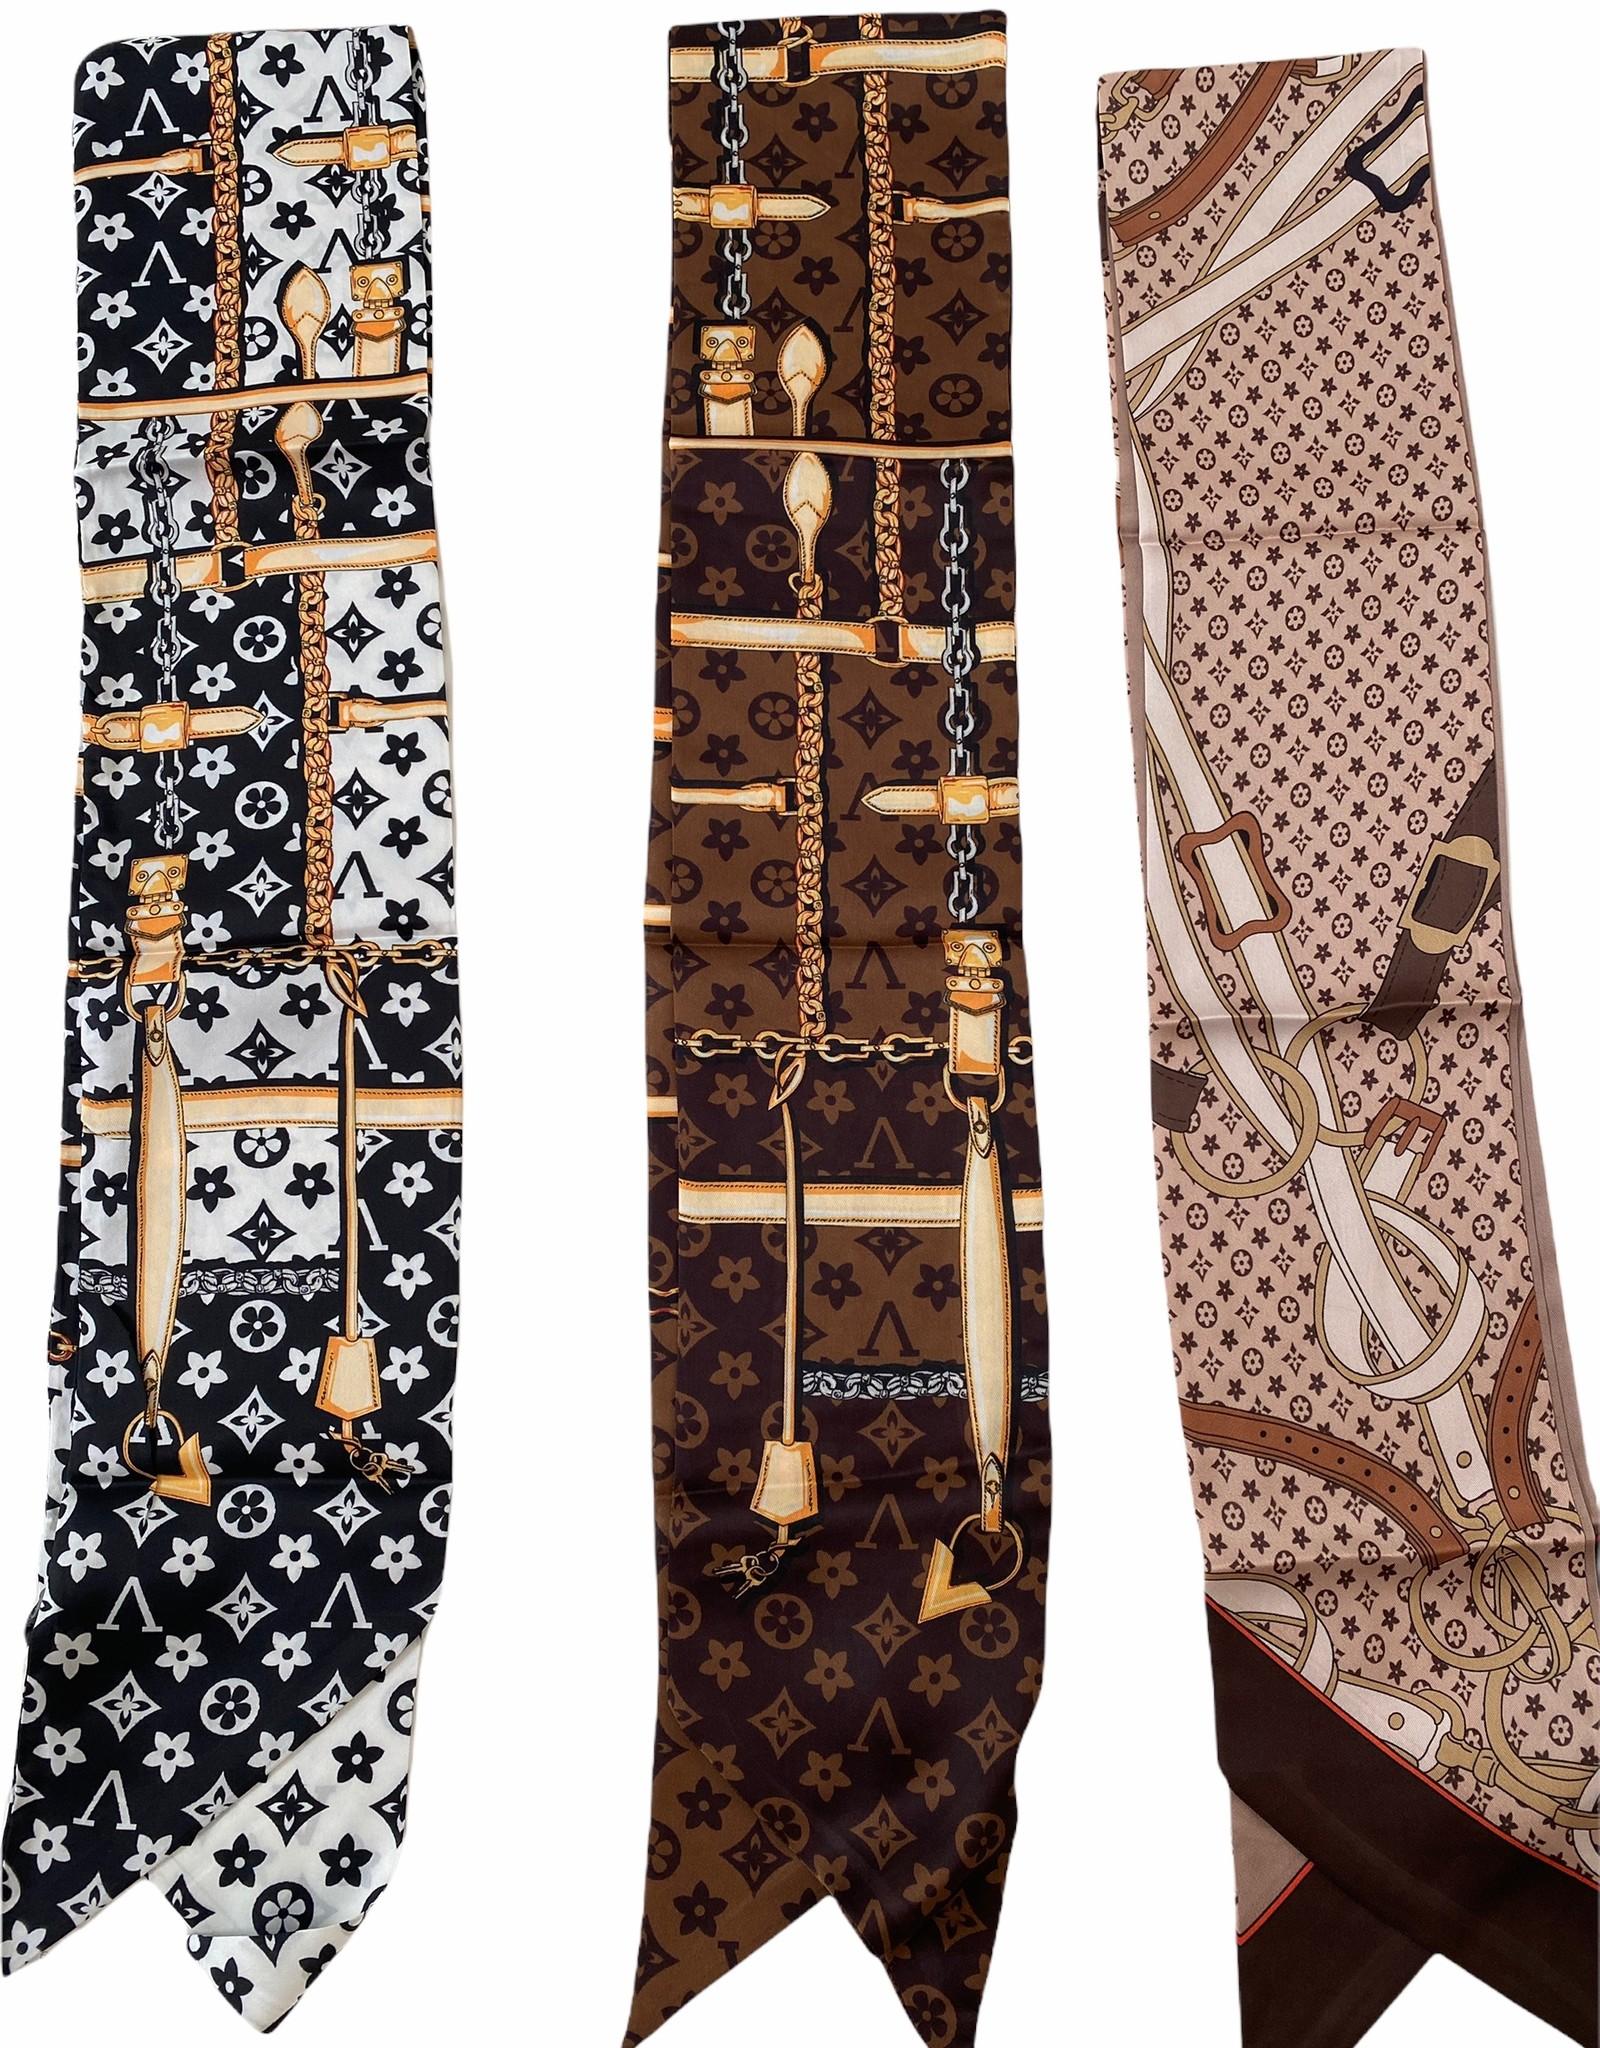 Multifunctional, silk scarf with brand logo